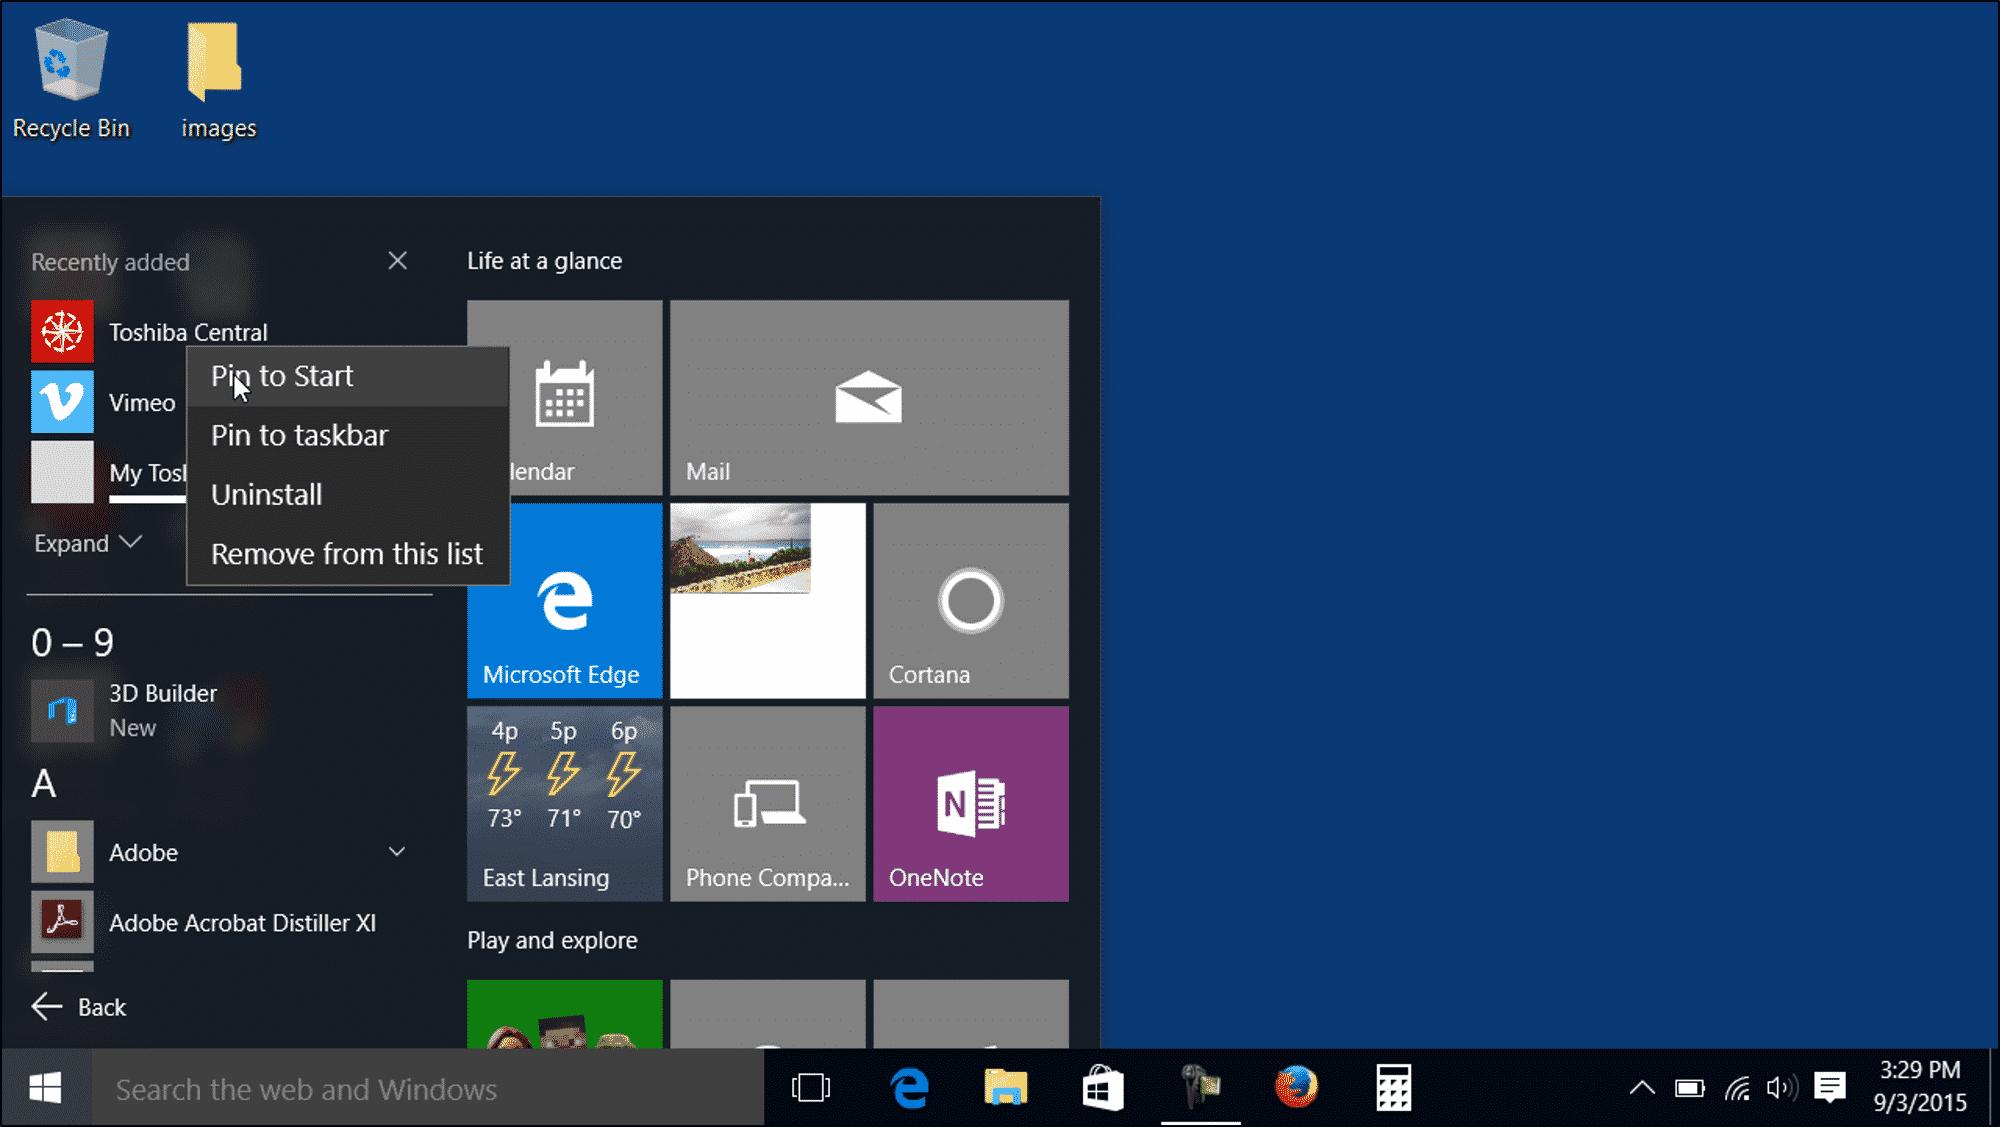 Customize the Start Menu in Windows 10 - Tutorial | 2000 x 1127 png 510kB